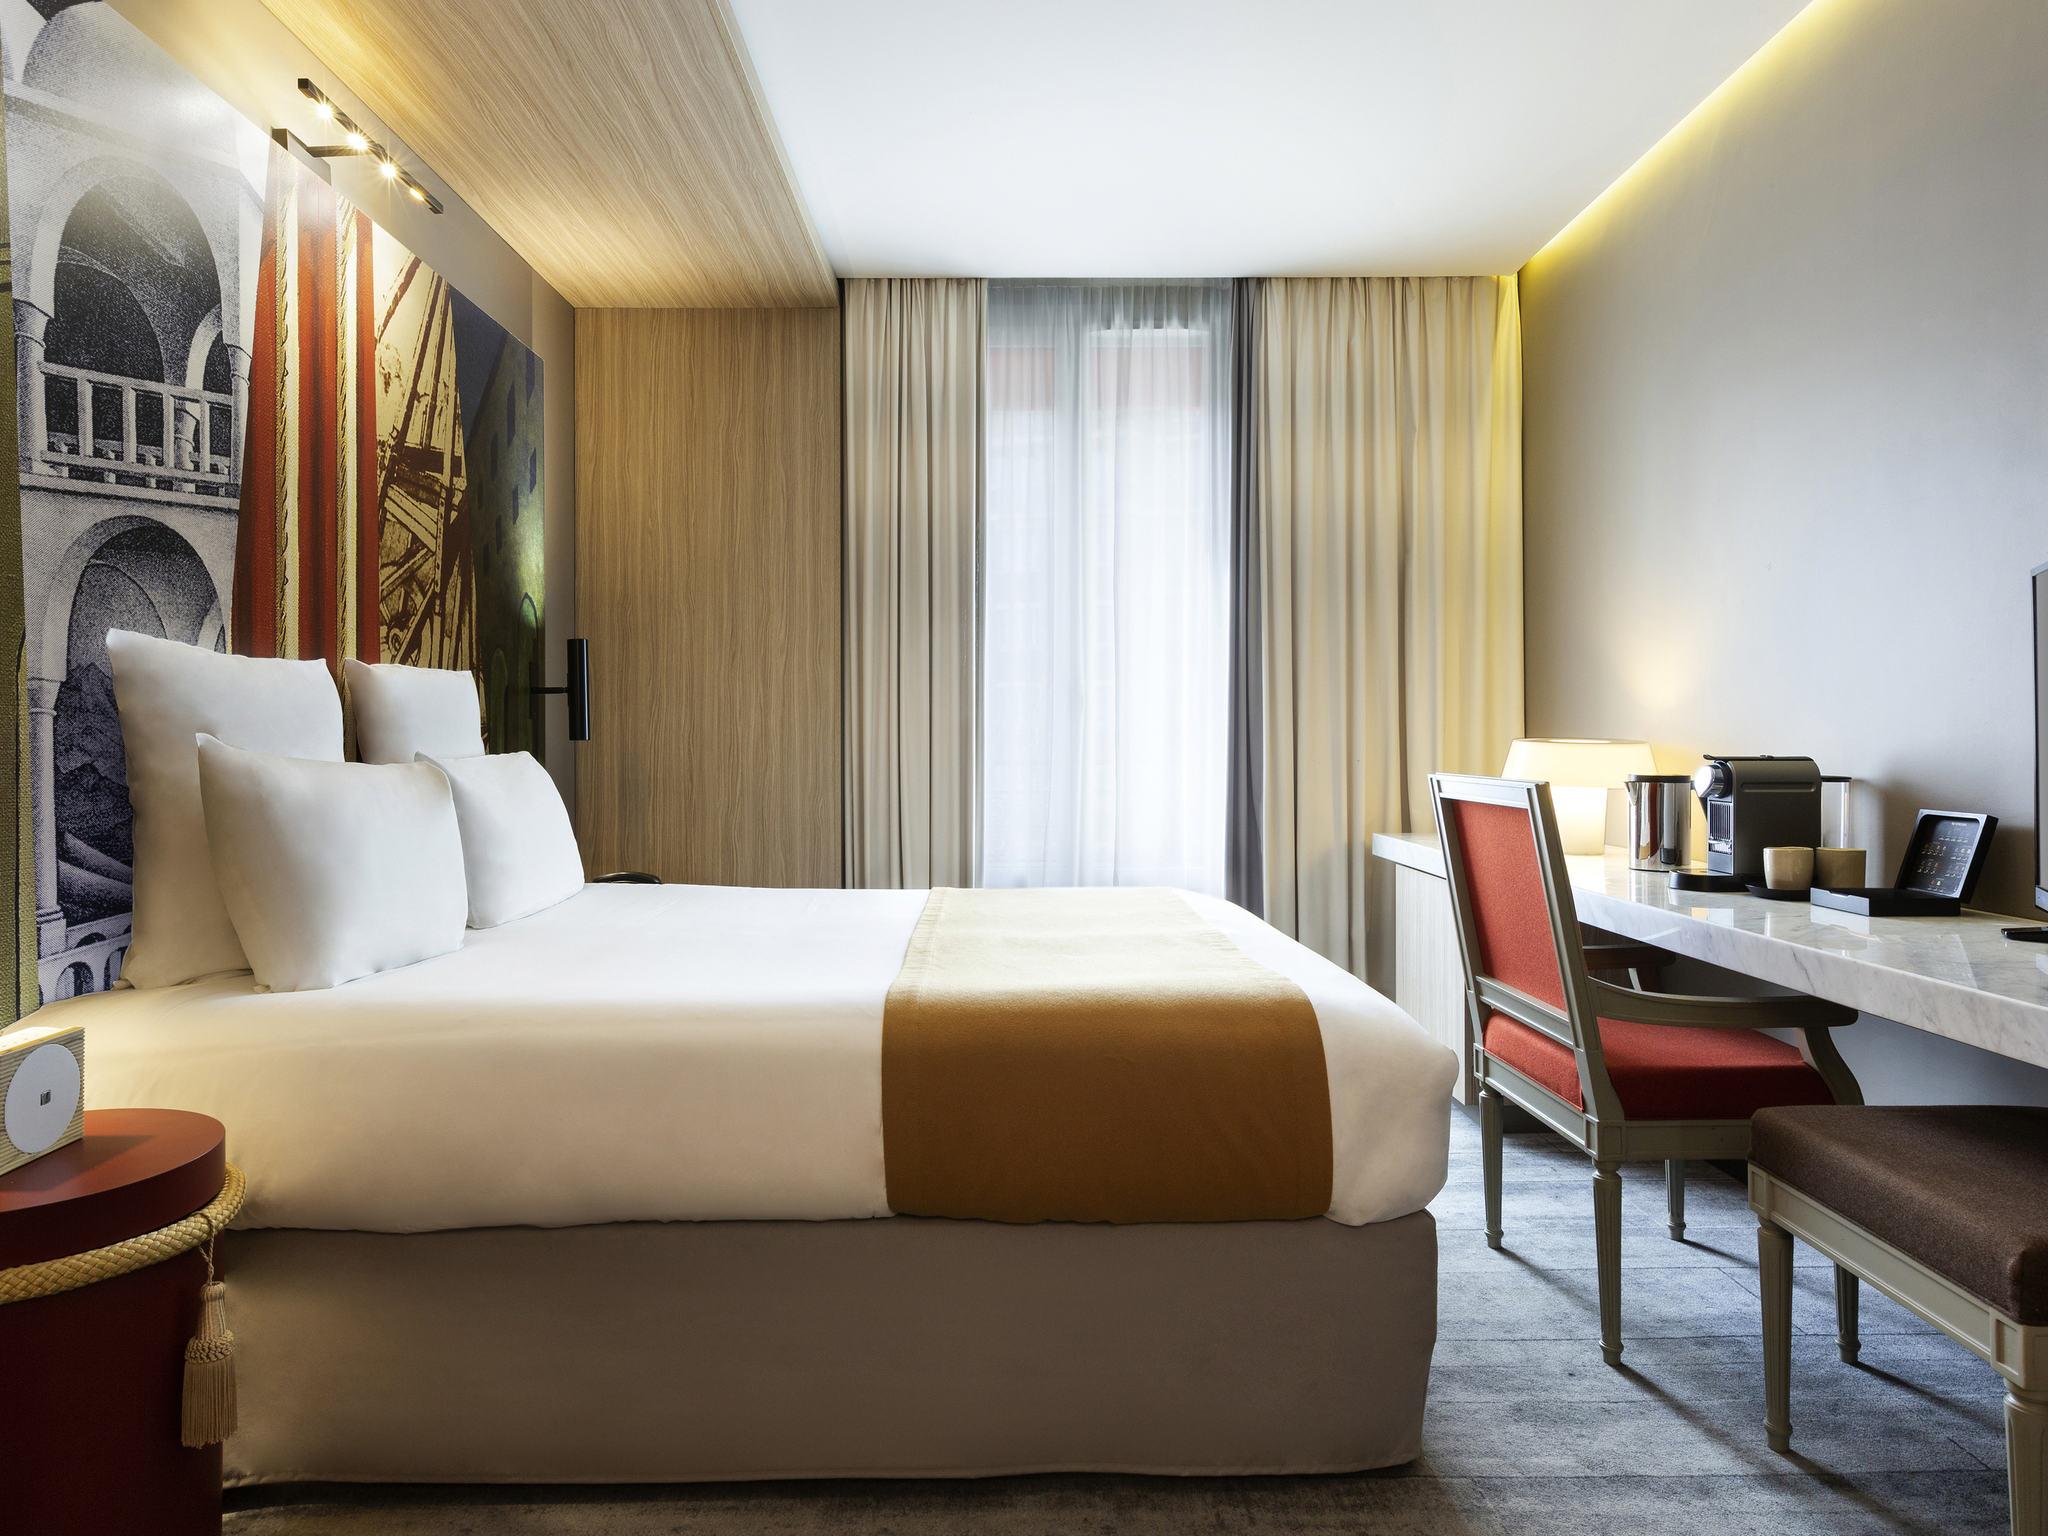 Hotel – Mercure Paris Alesia hotel